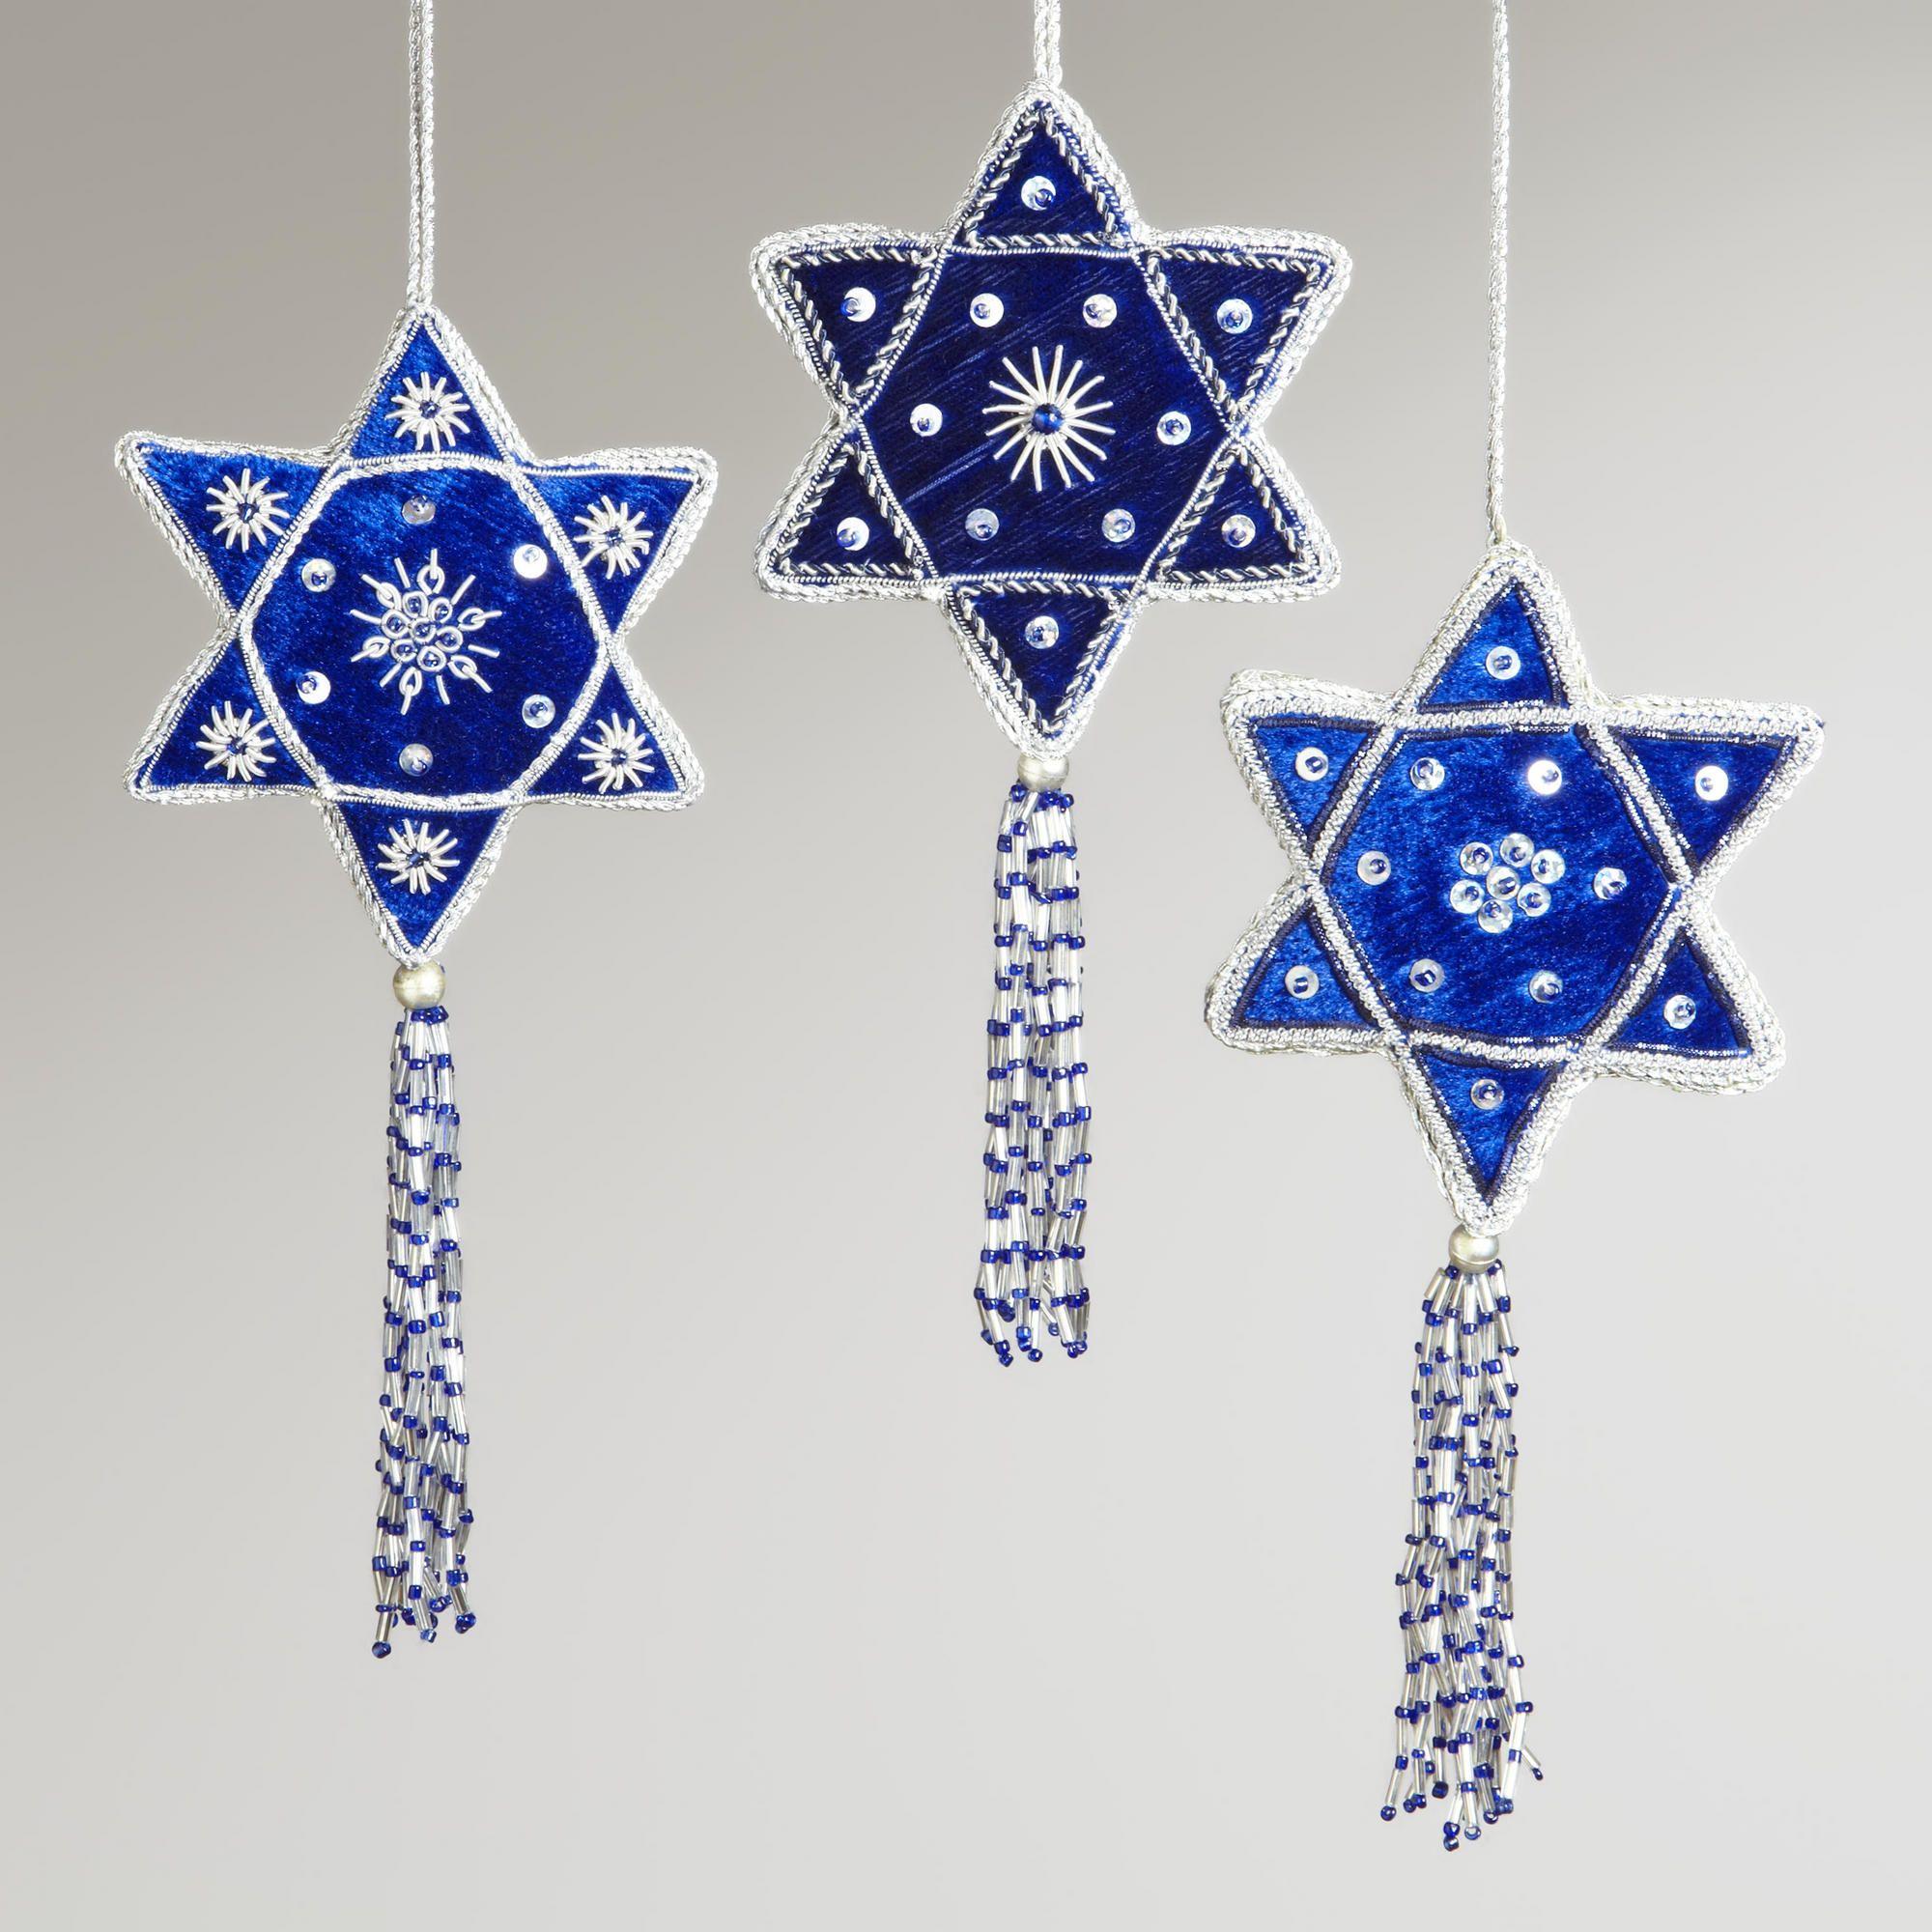 Star Of David Ornaments Set Of 3